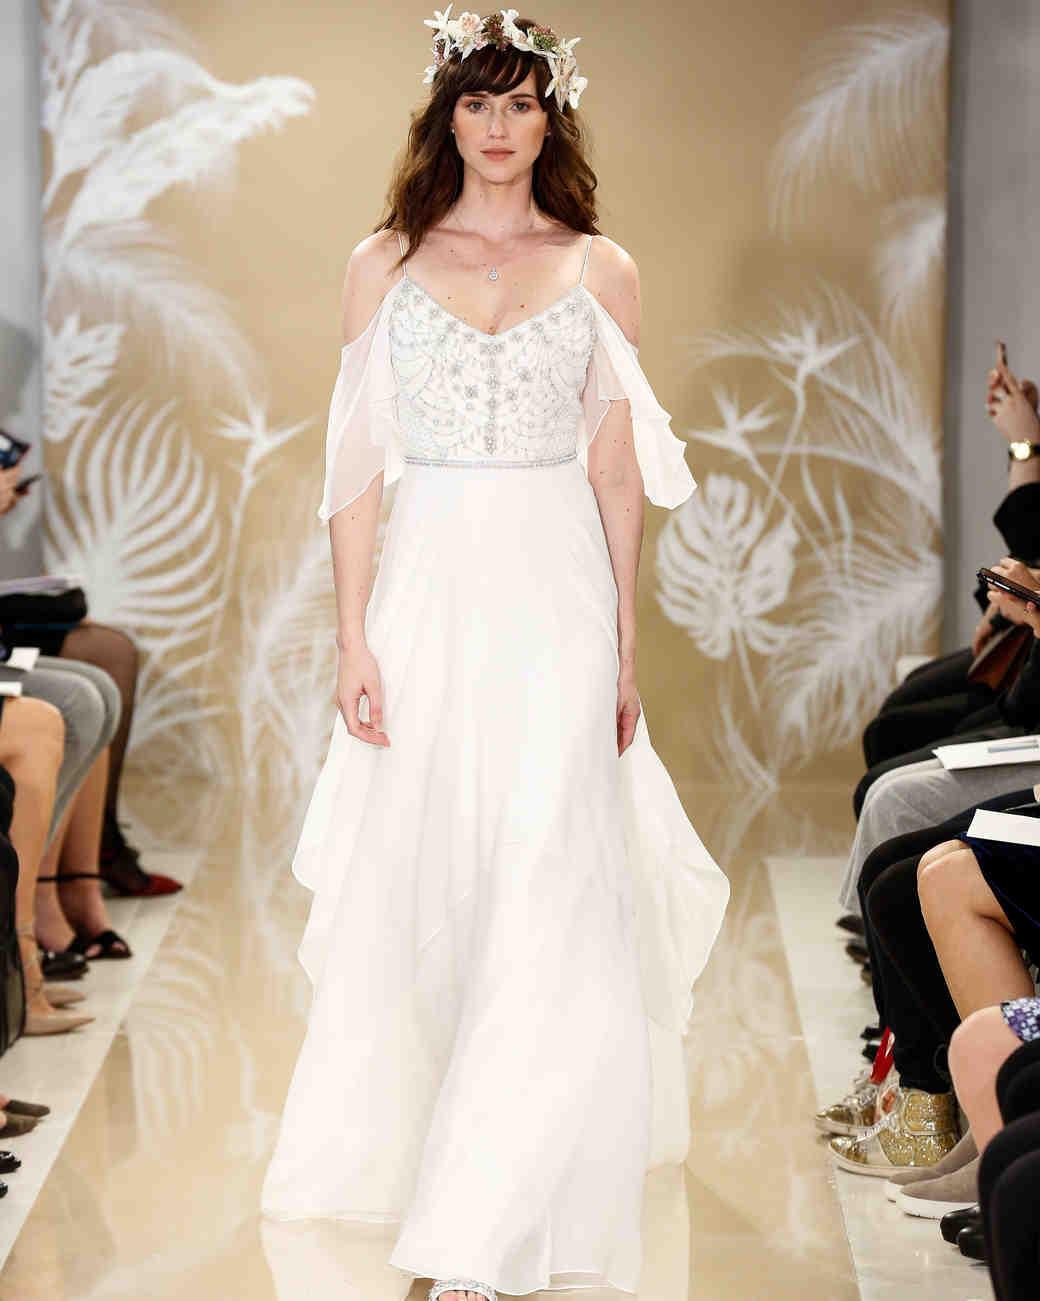 Sweetheart Ruffles Daria's Wedding Dress With